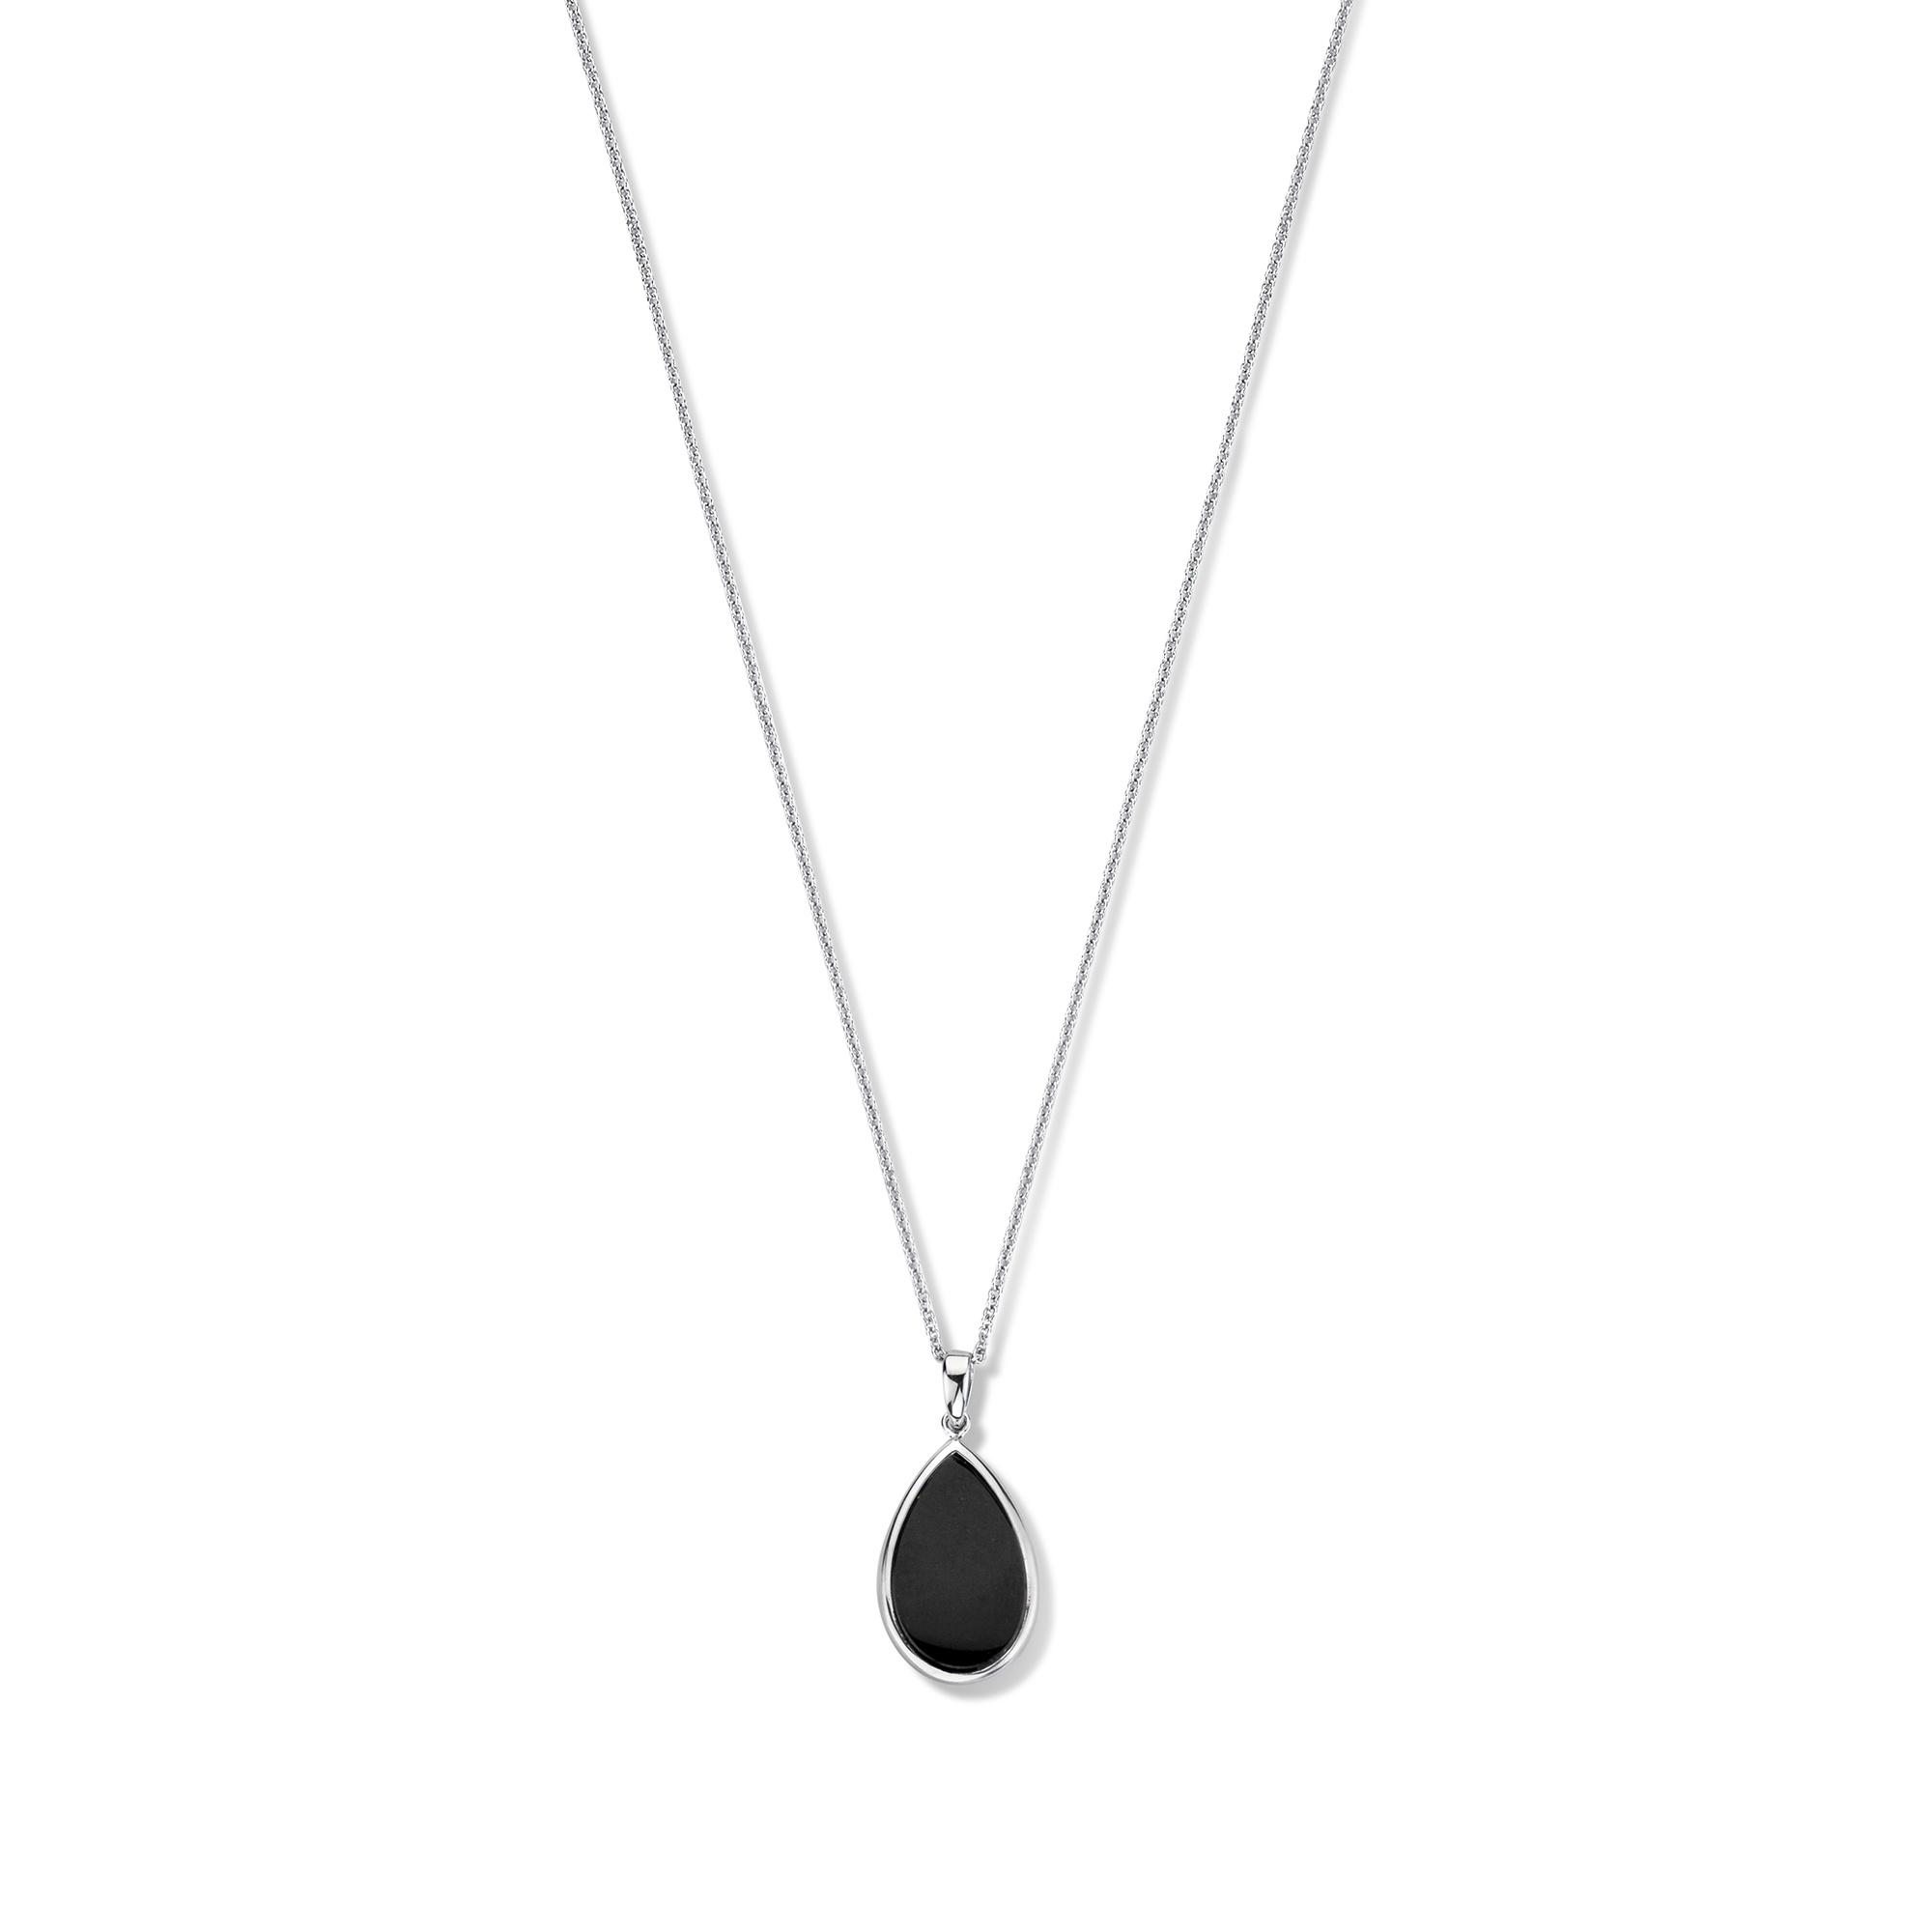 Parte di Me La Sirena Serchio 925 sterling zilveren ketting met zwarte onyx